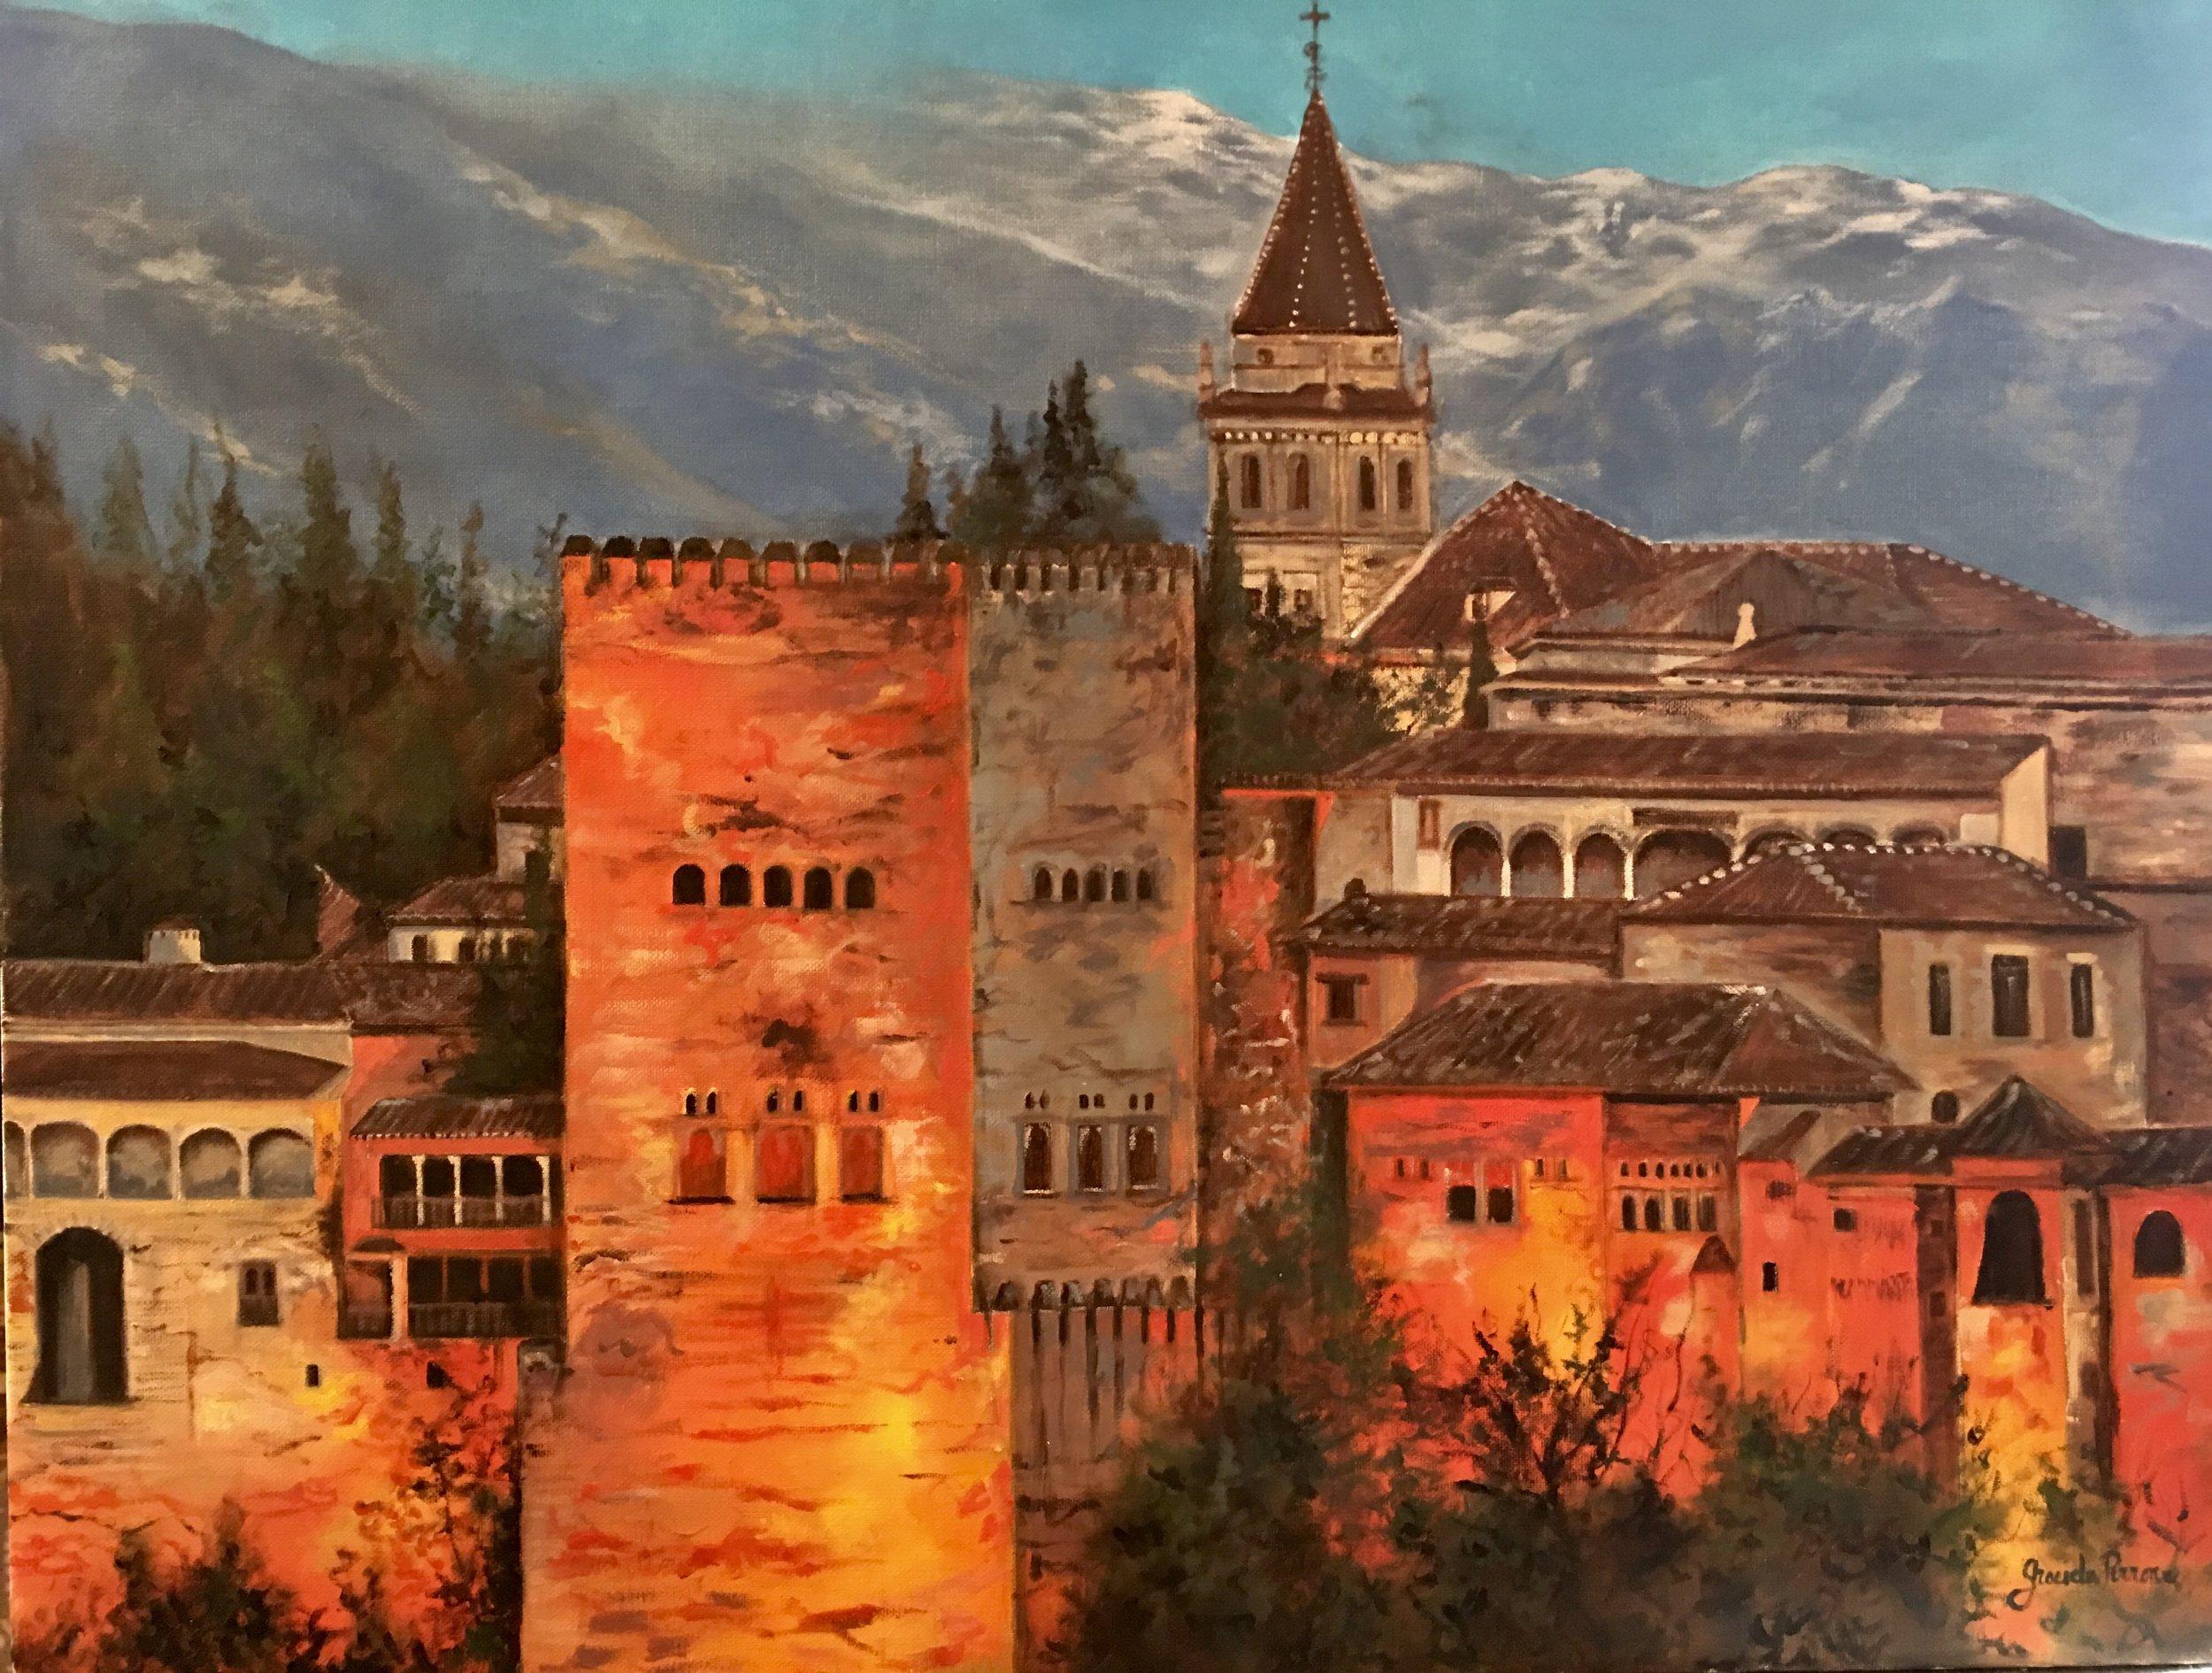 Alhambra - Series